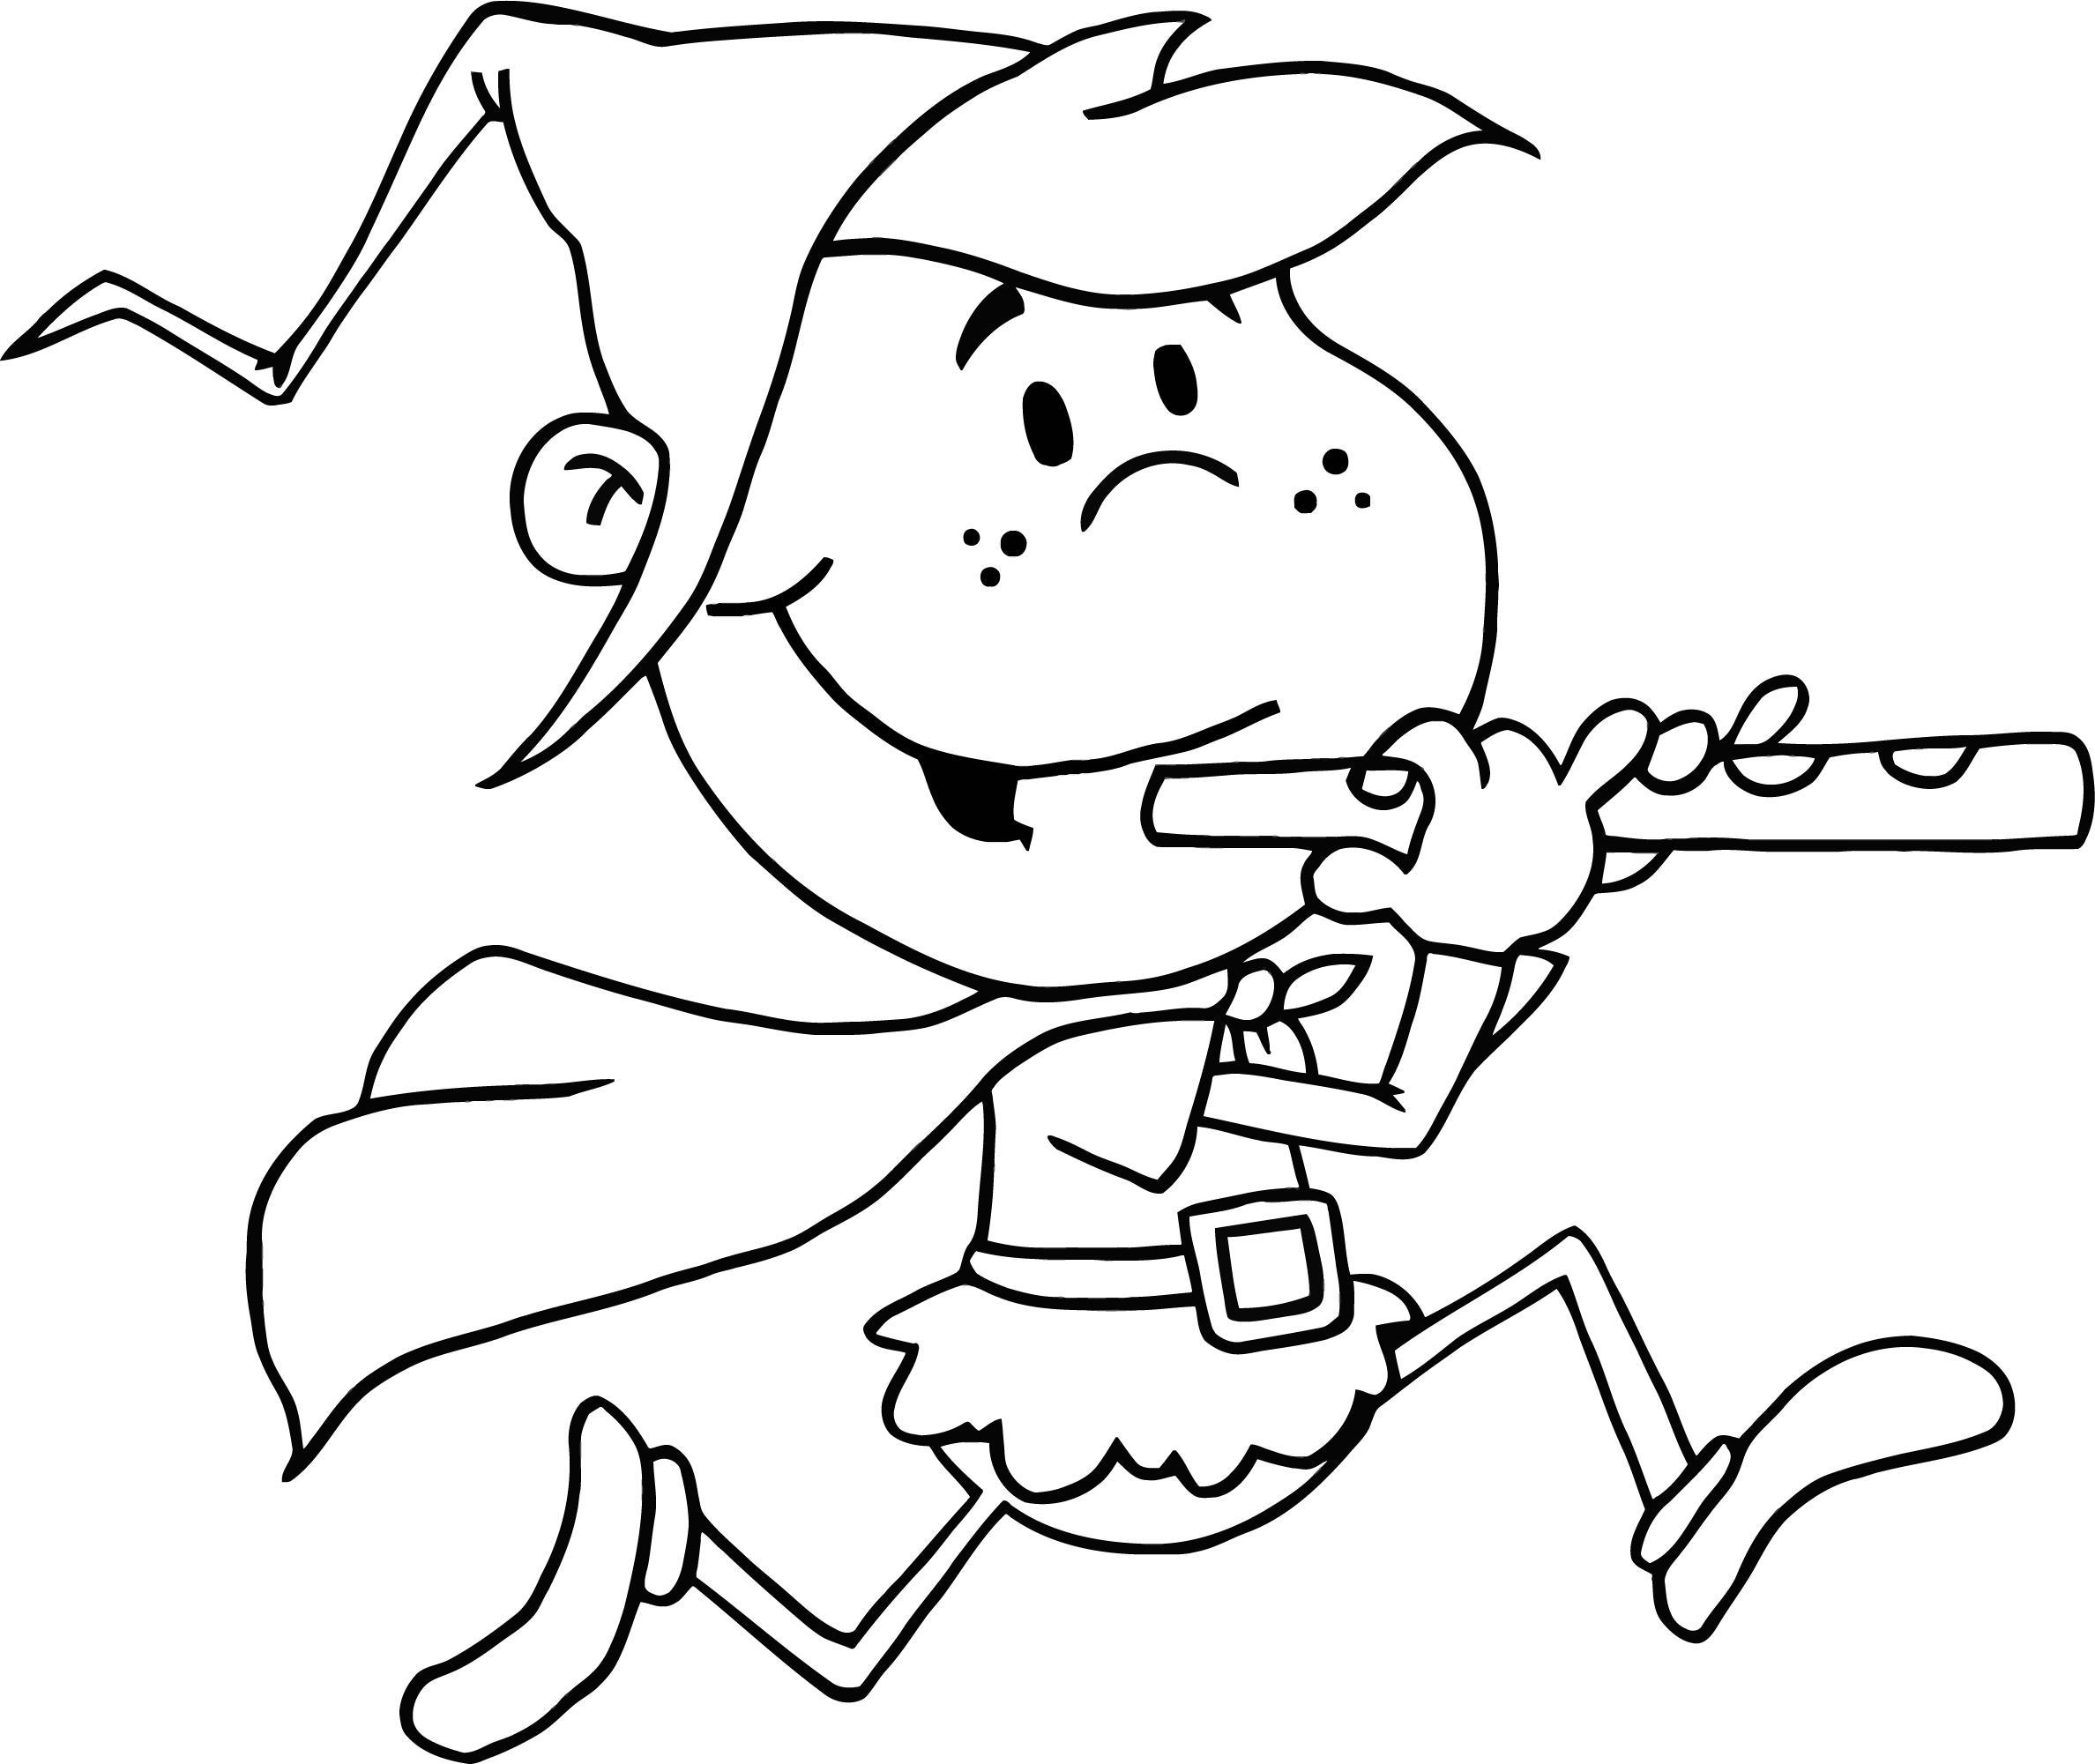 Free Piper Cliparts, Download Free Clip Art, Free Clip Art.